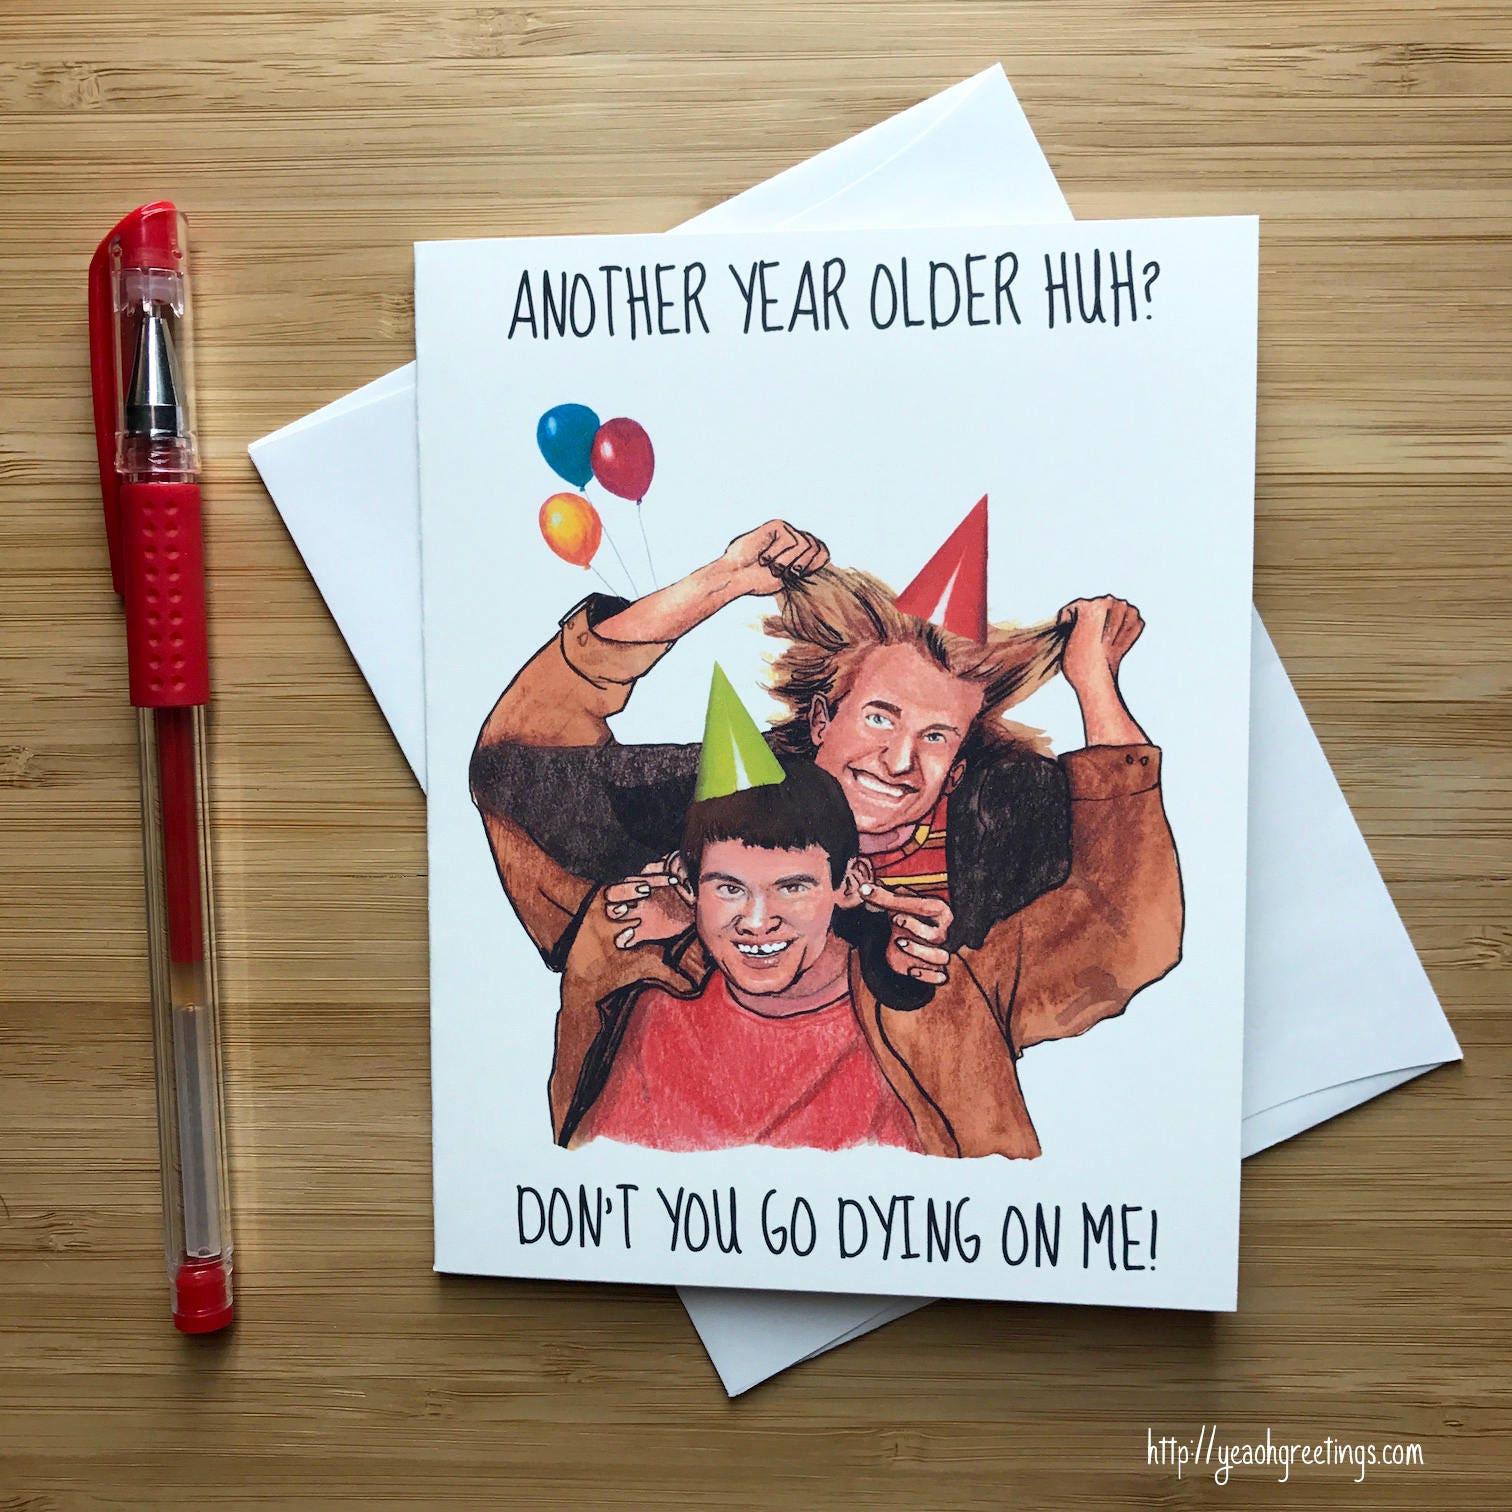 Dumb and Dumber Birthday Card Harry and Lloyd Jim Carrey